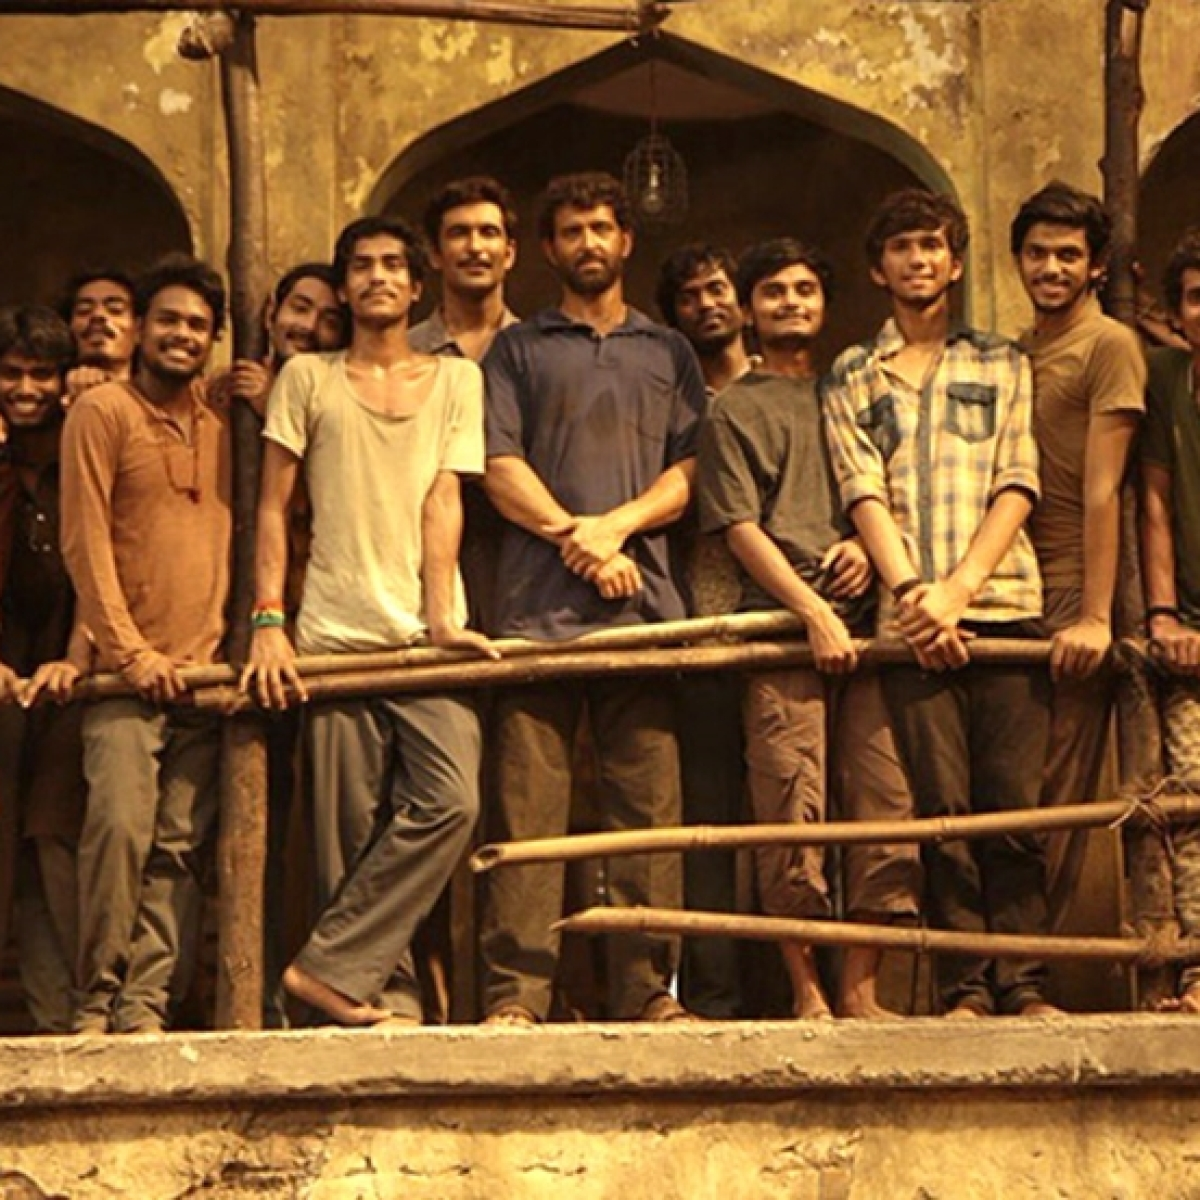 After Bihar, Rajasthan declares Hrithik Roshan starrer 'Super 30' declared tax free